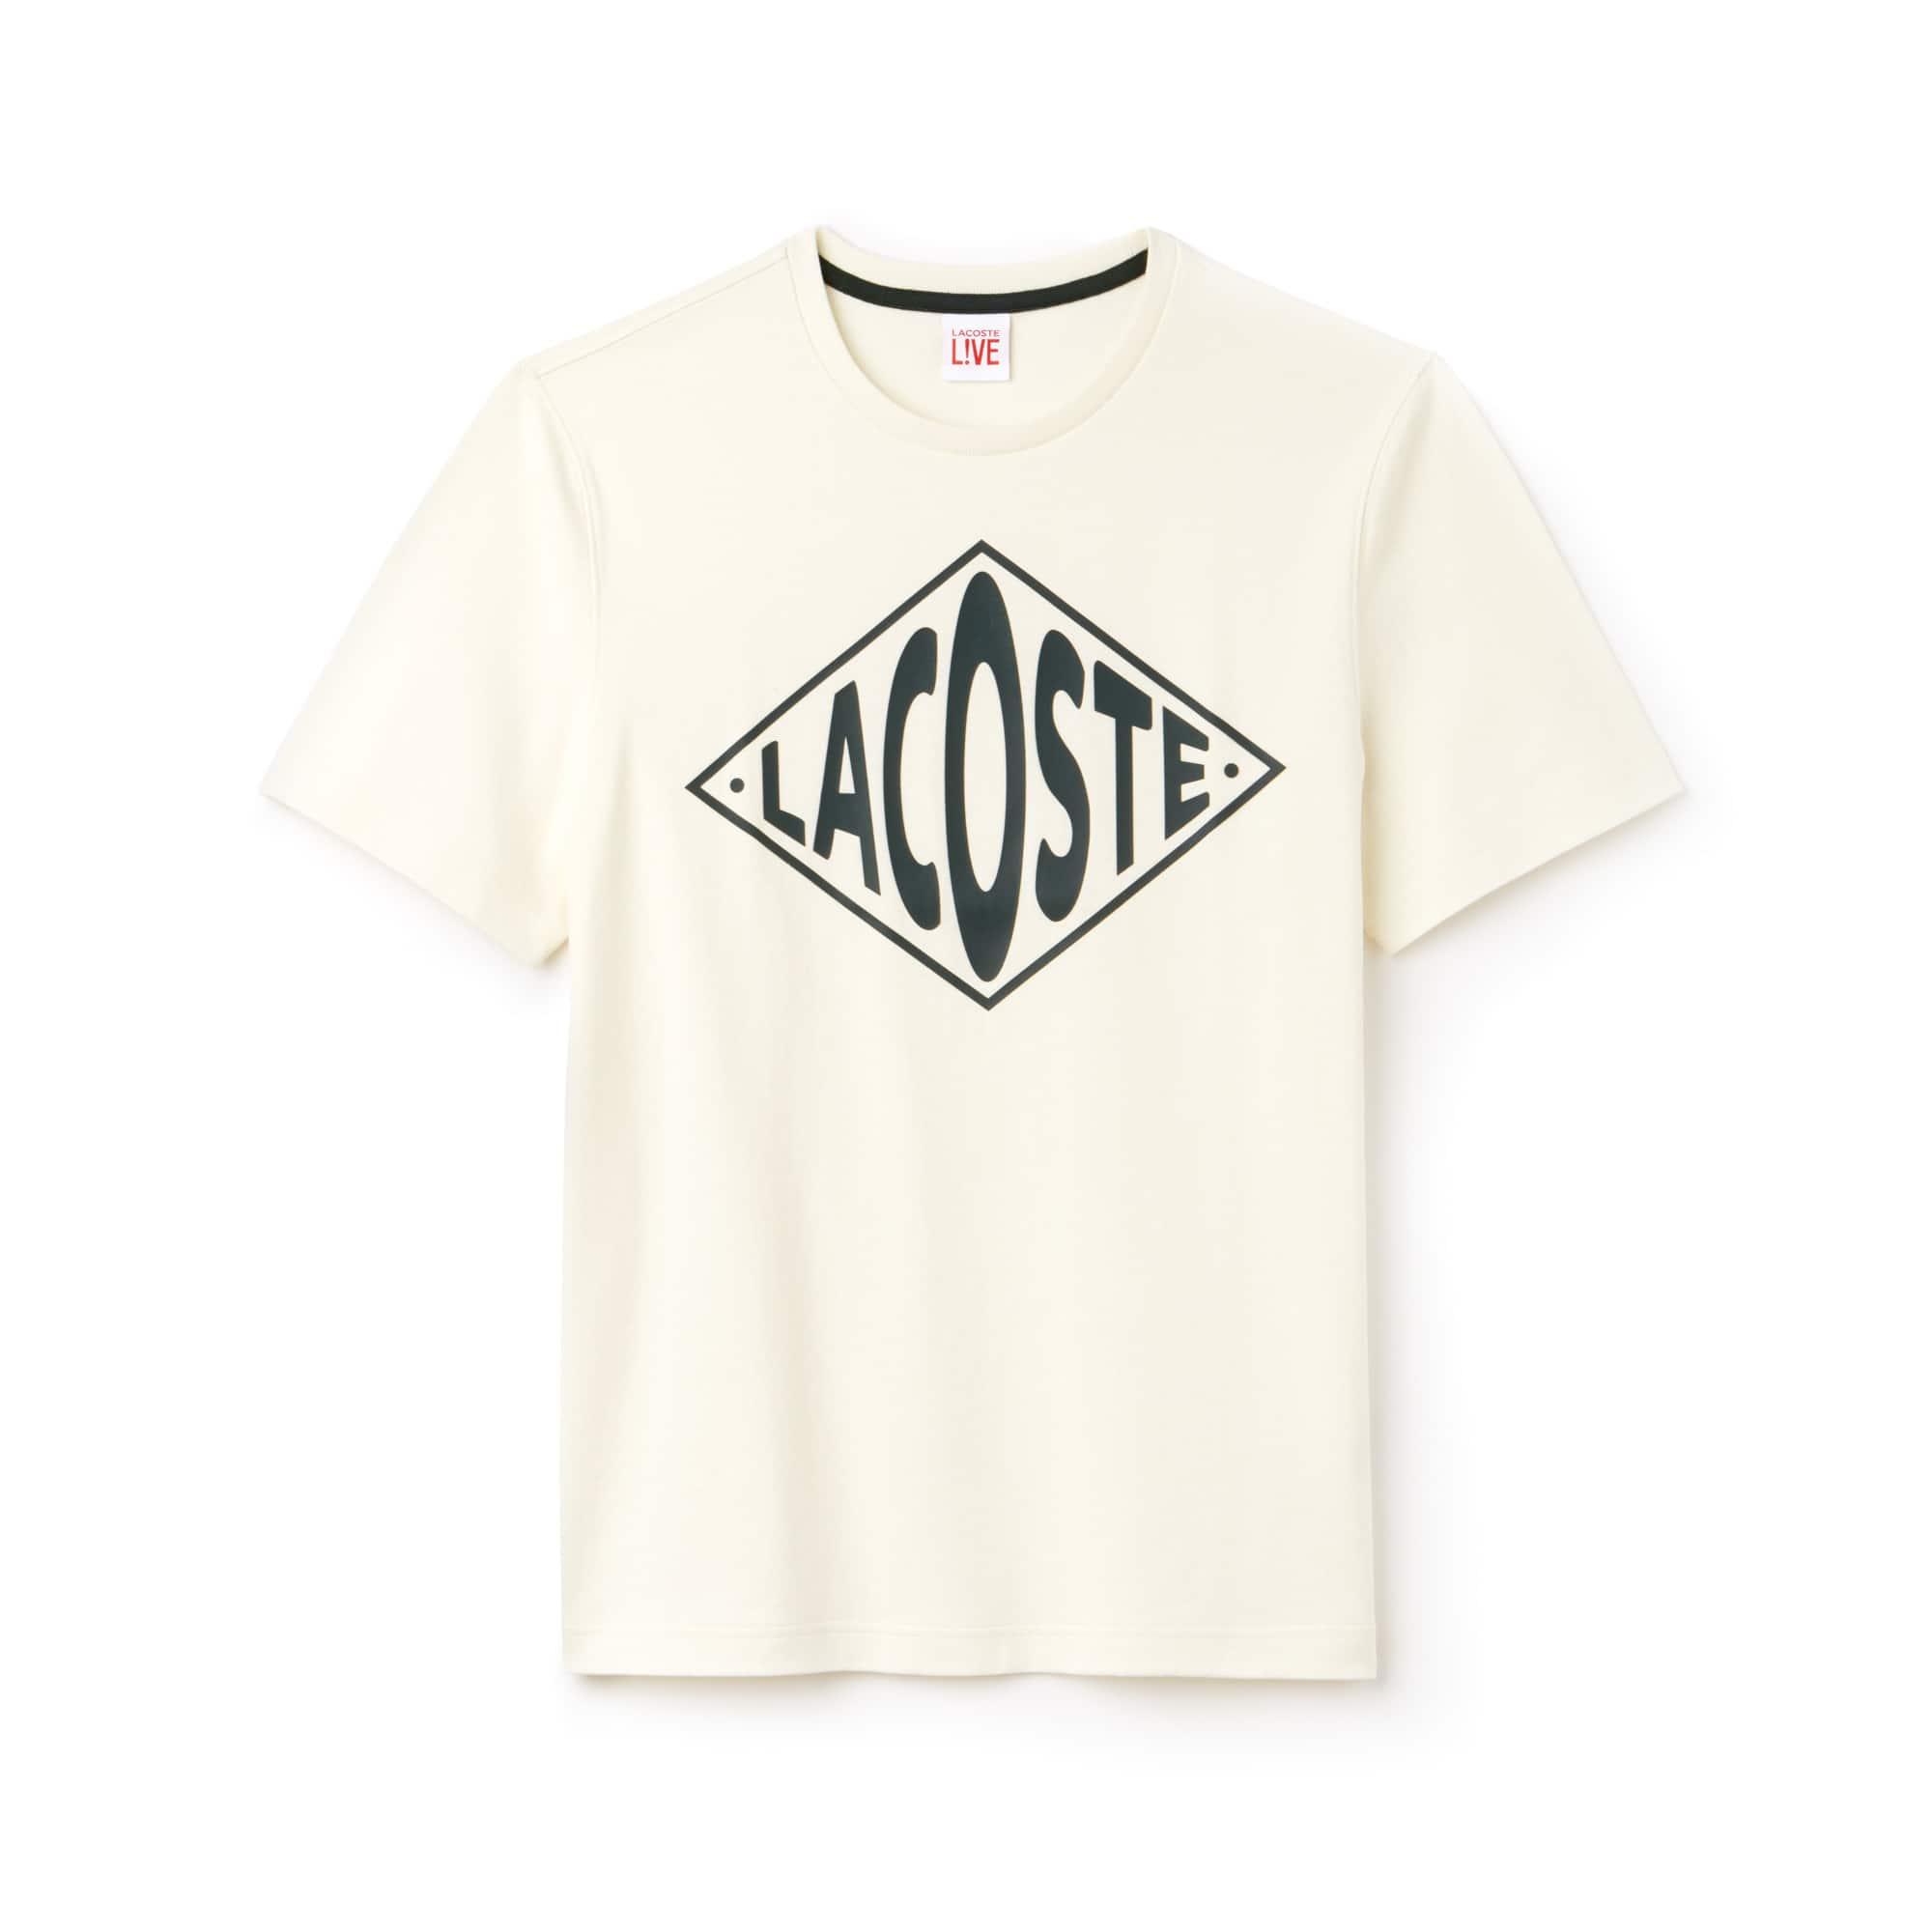 Lacoste LIVE系列圆领大号Logo平纹针织面料T恤,男女皆宜